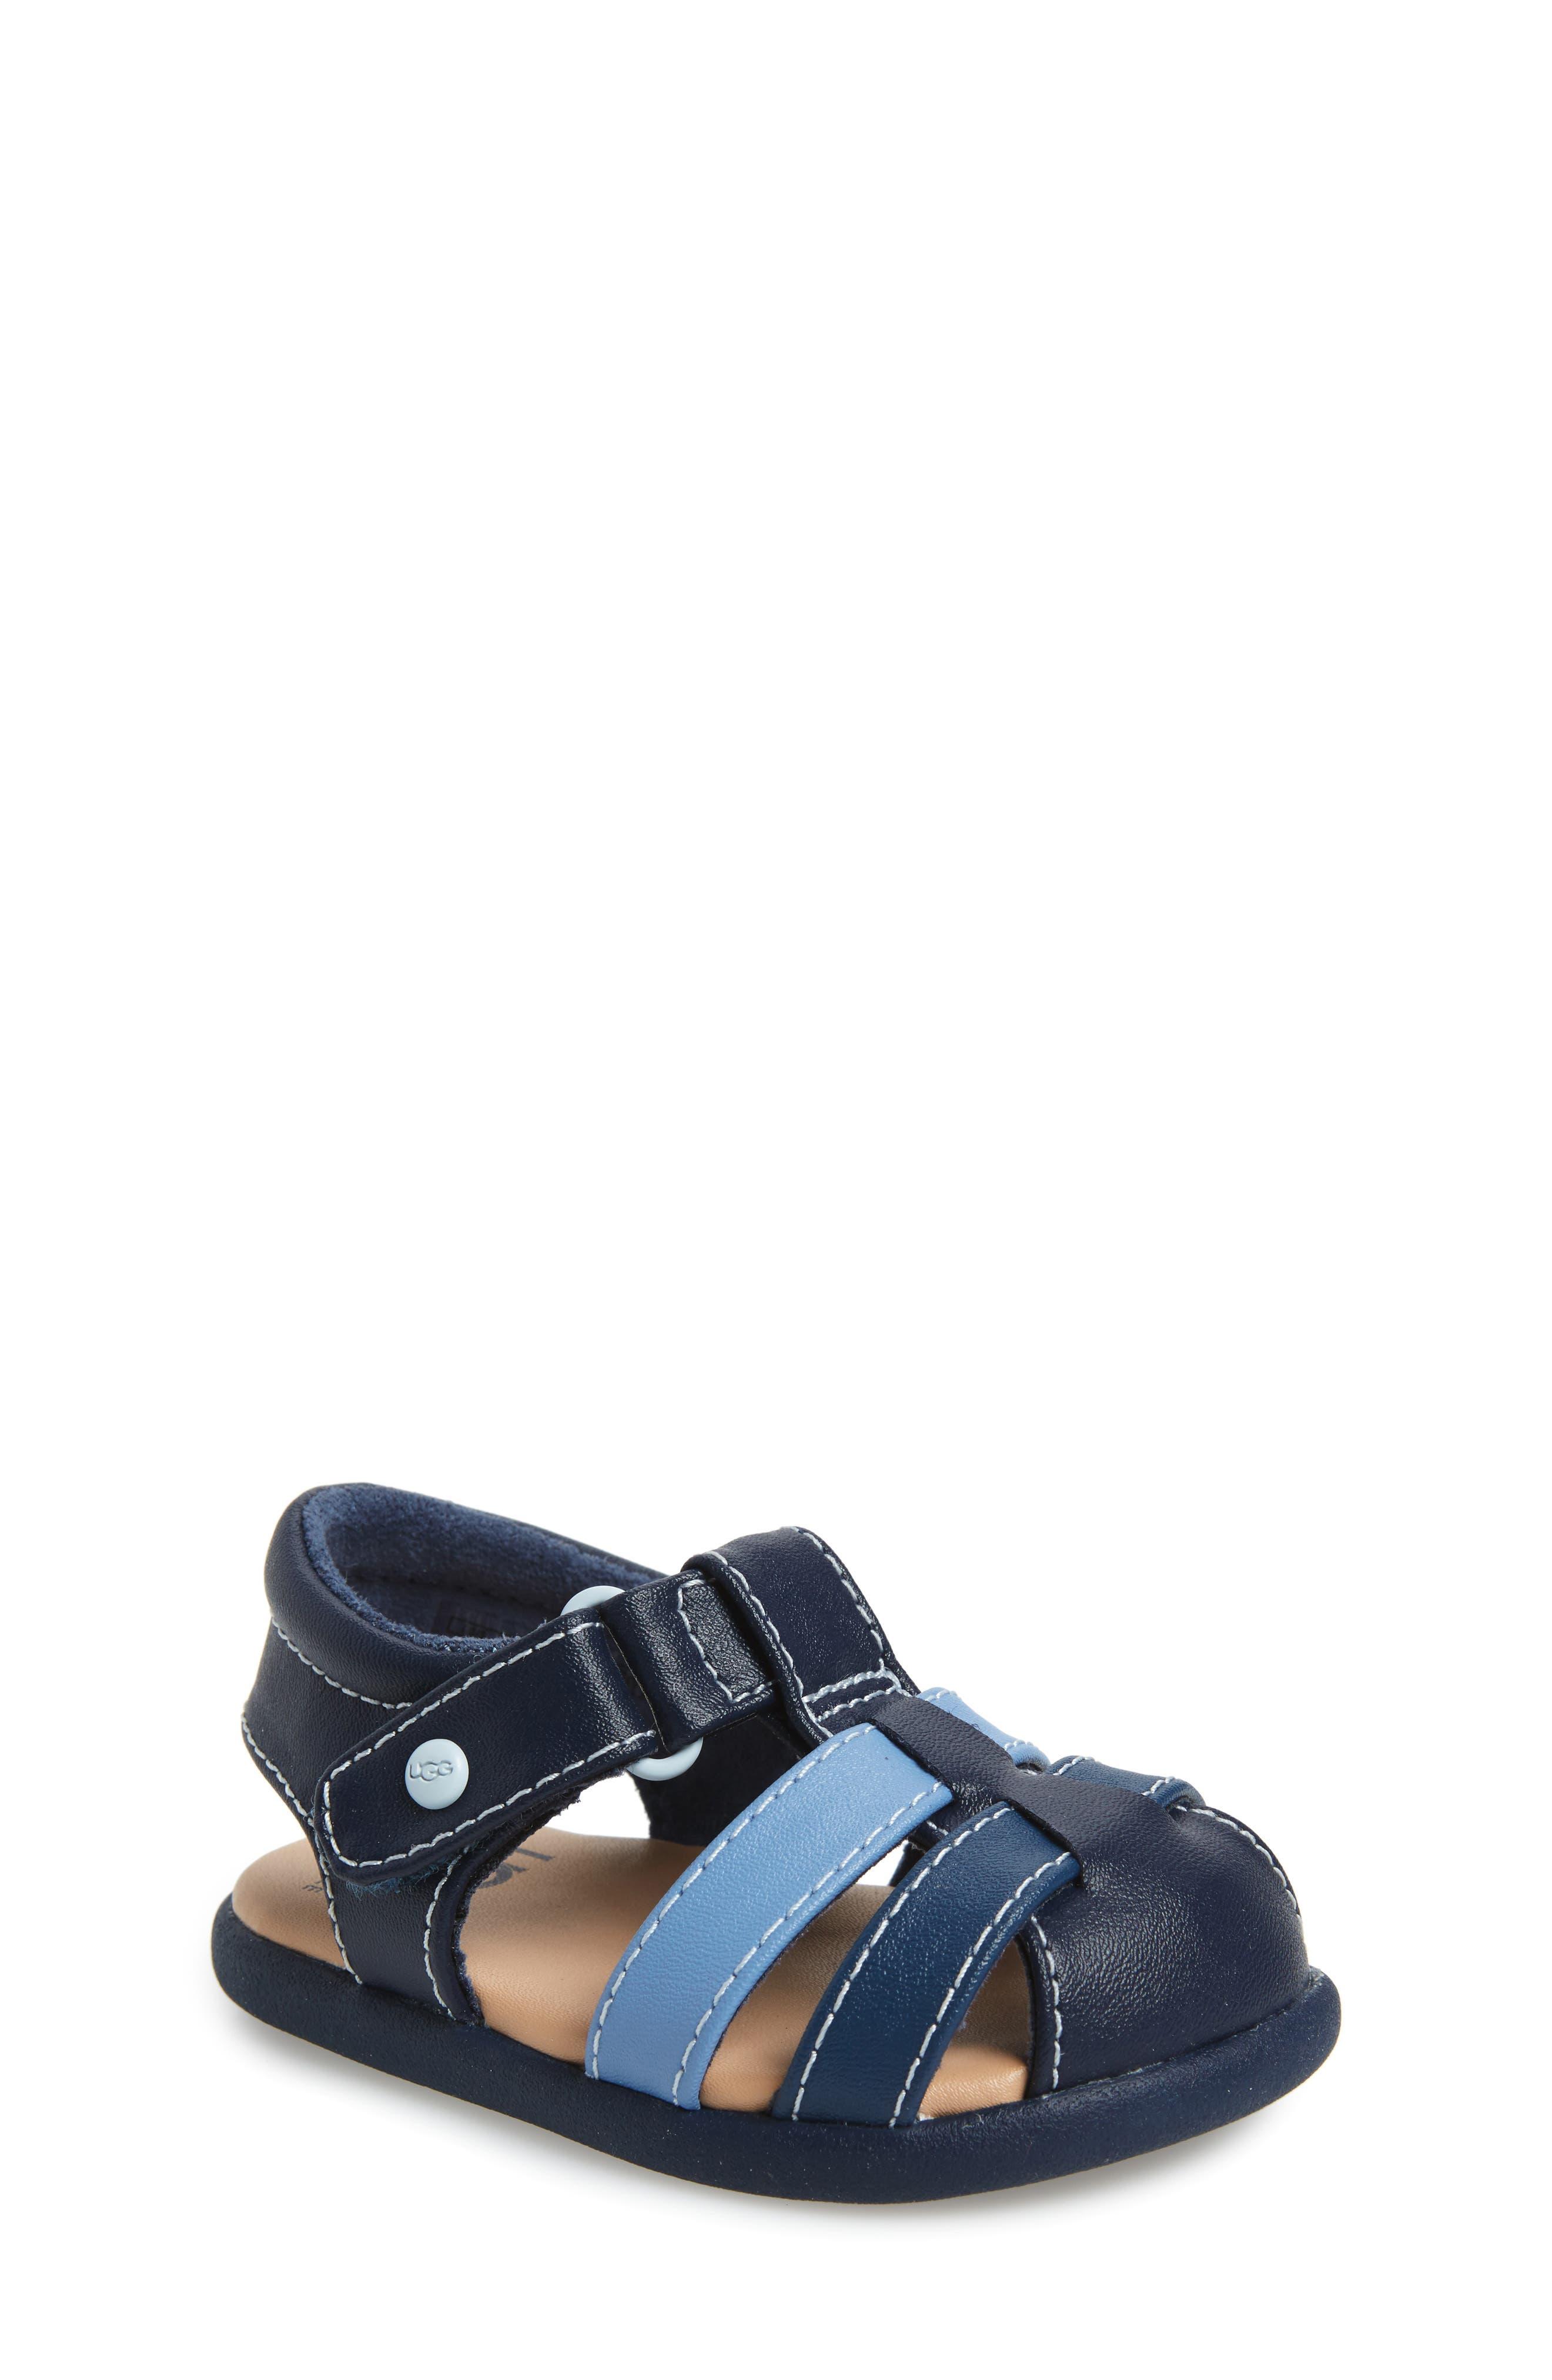 Kolding Sandal,                         Main,                         color, Navy